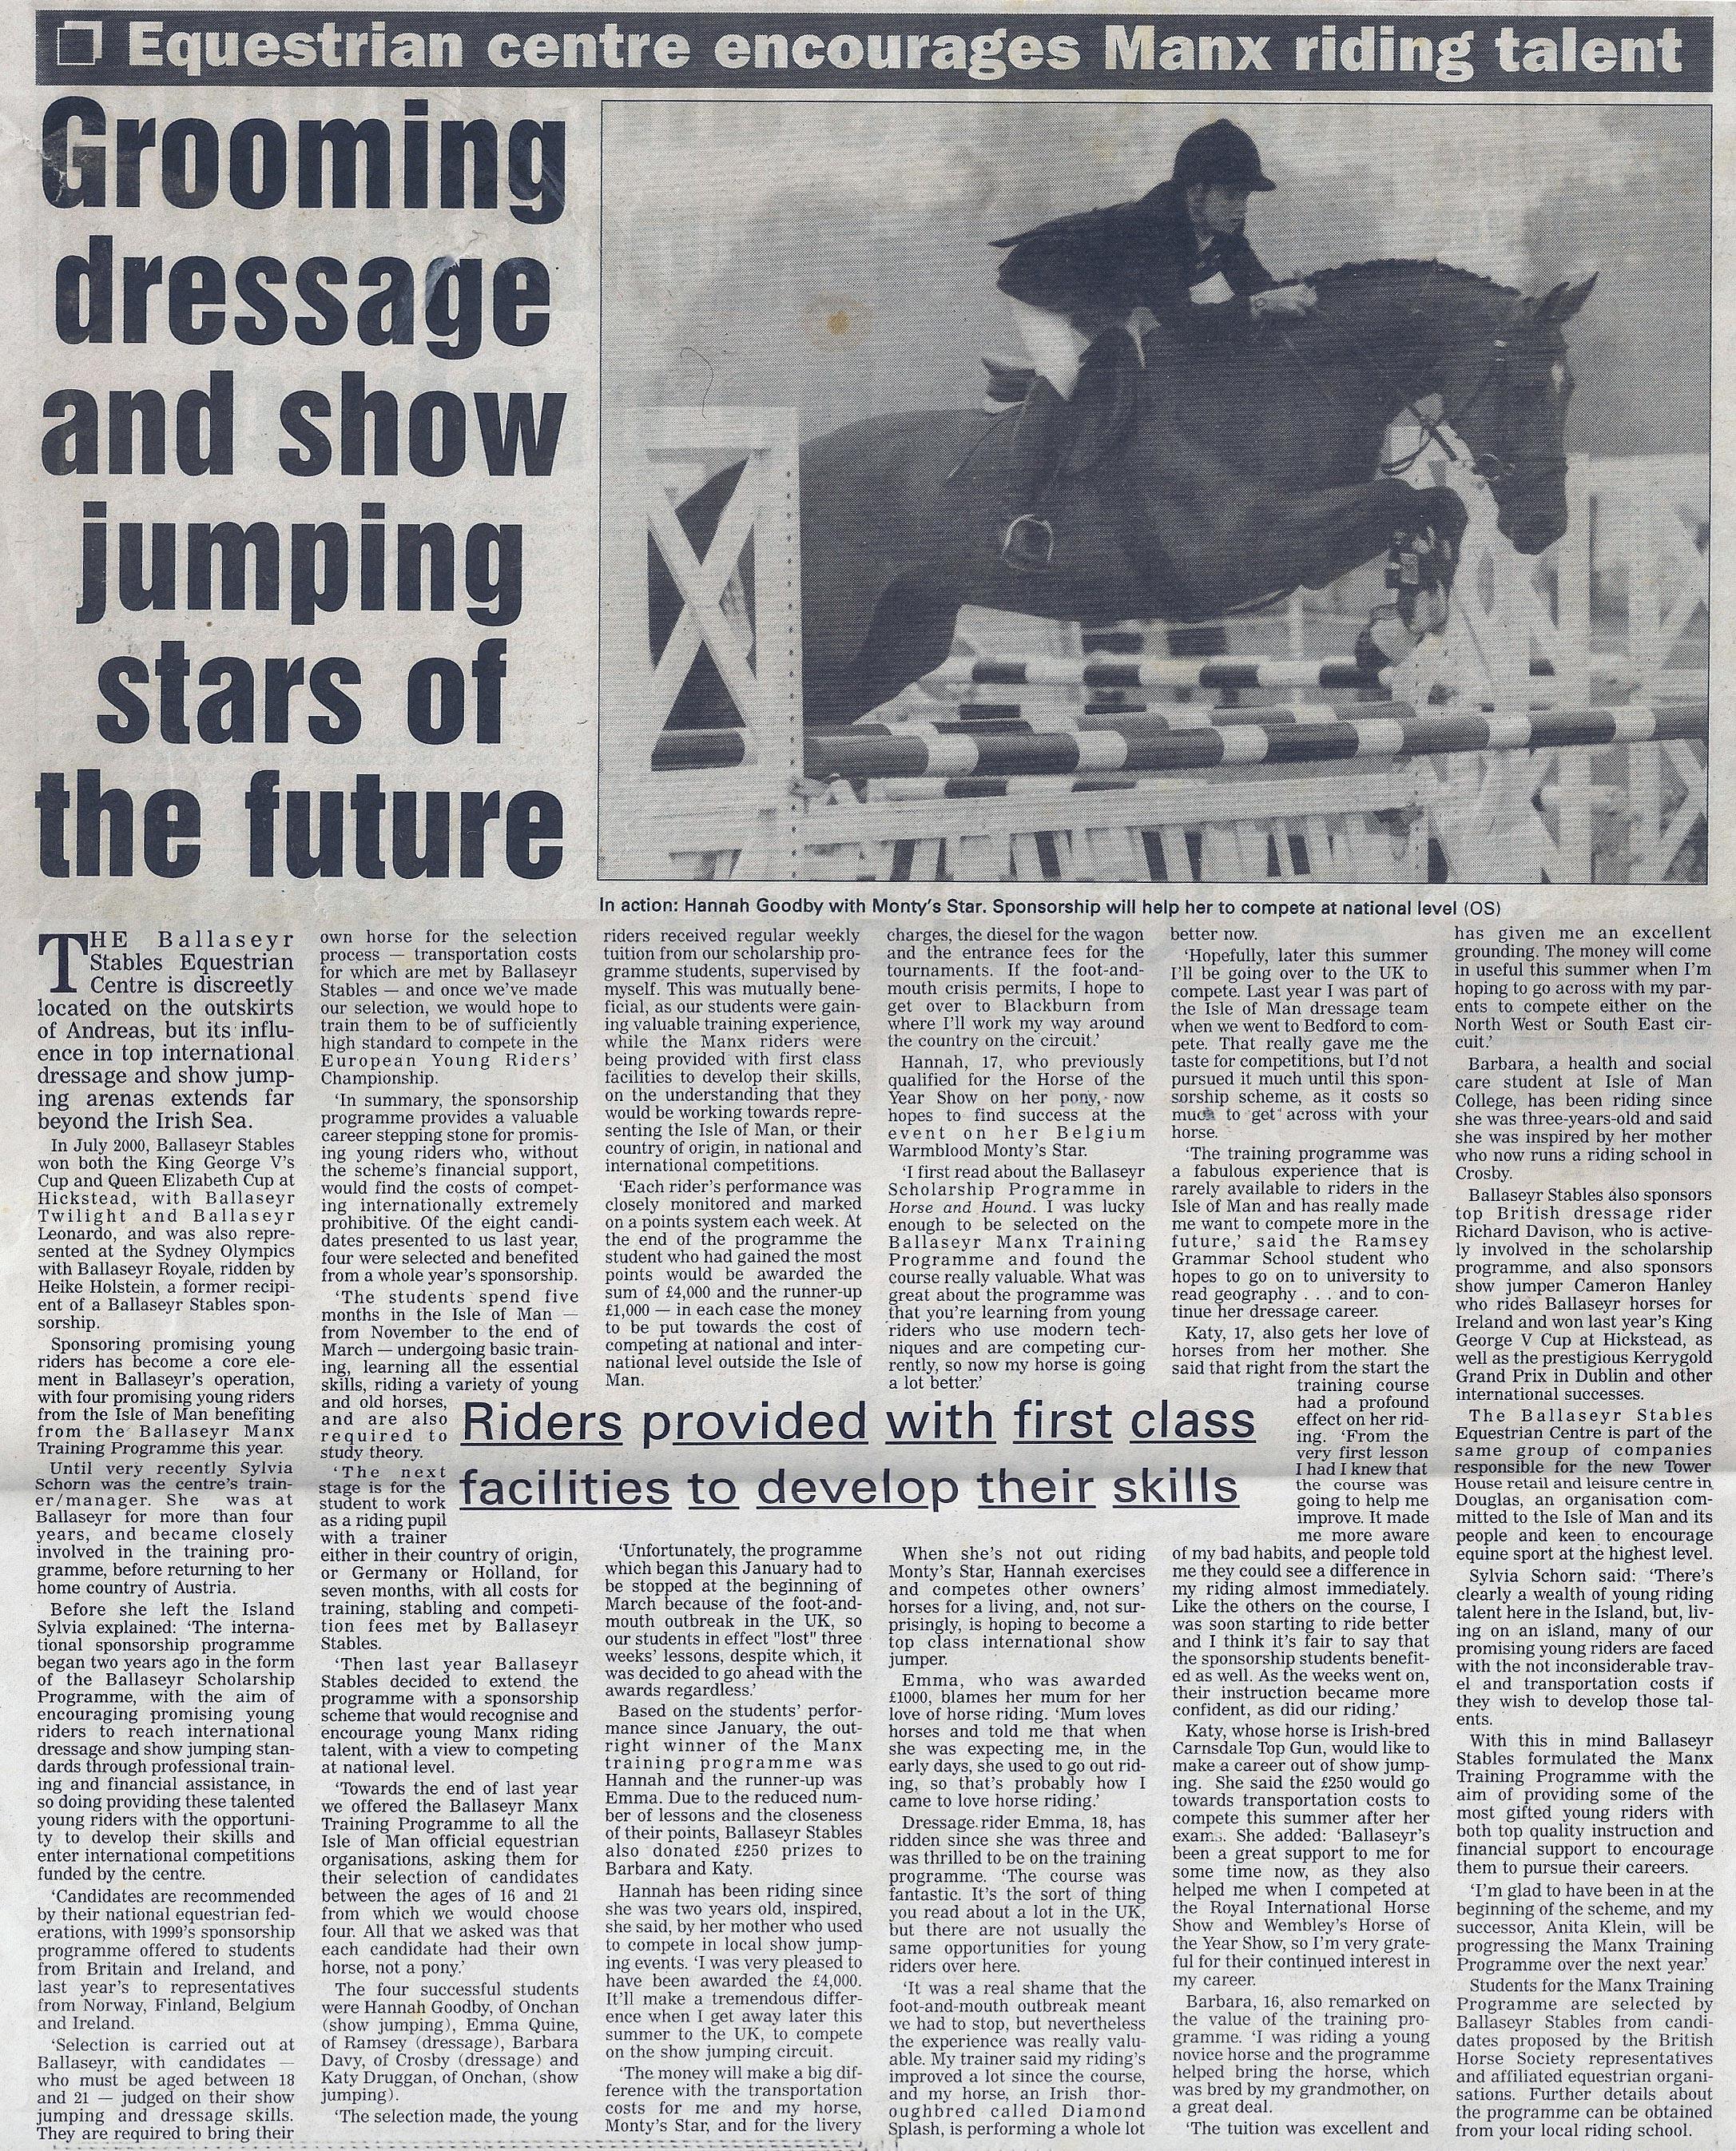 Ballaseyr Equestrian Centre encourages Manx Riding Talent 2001